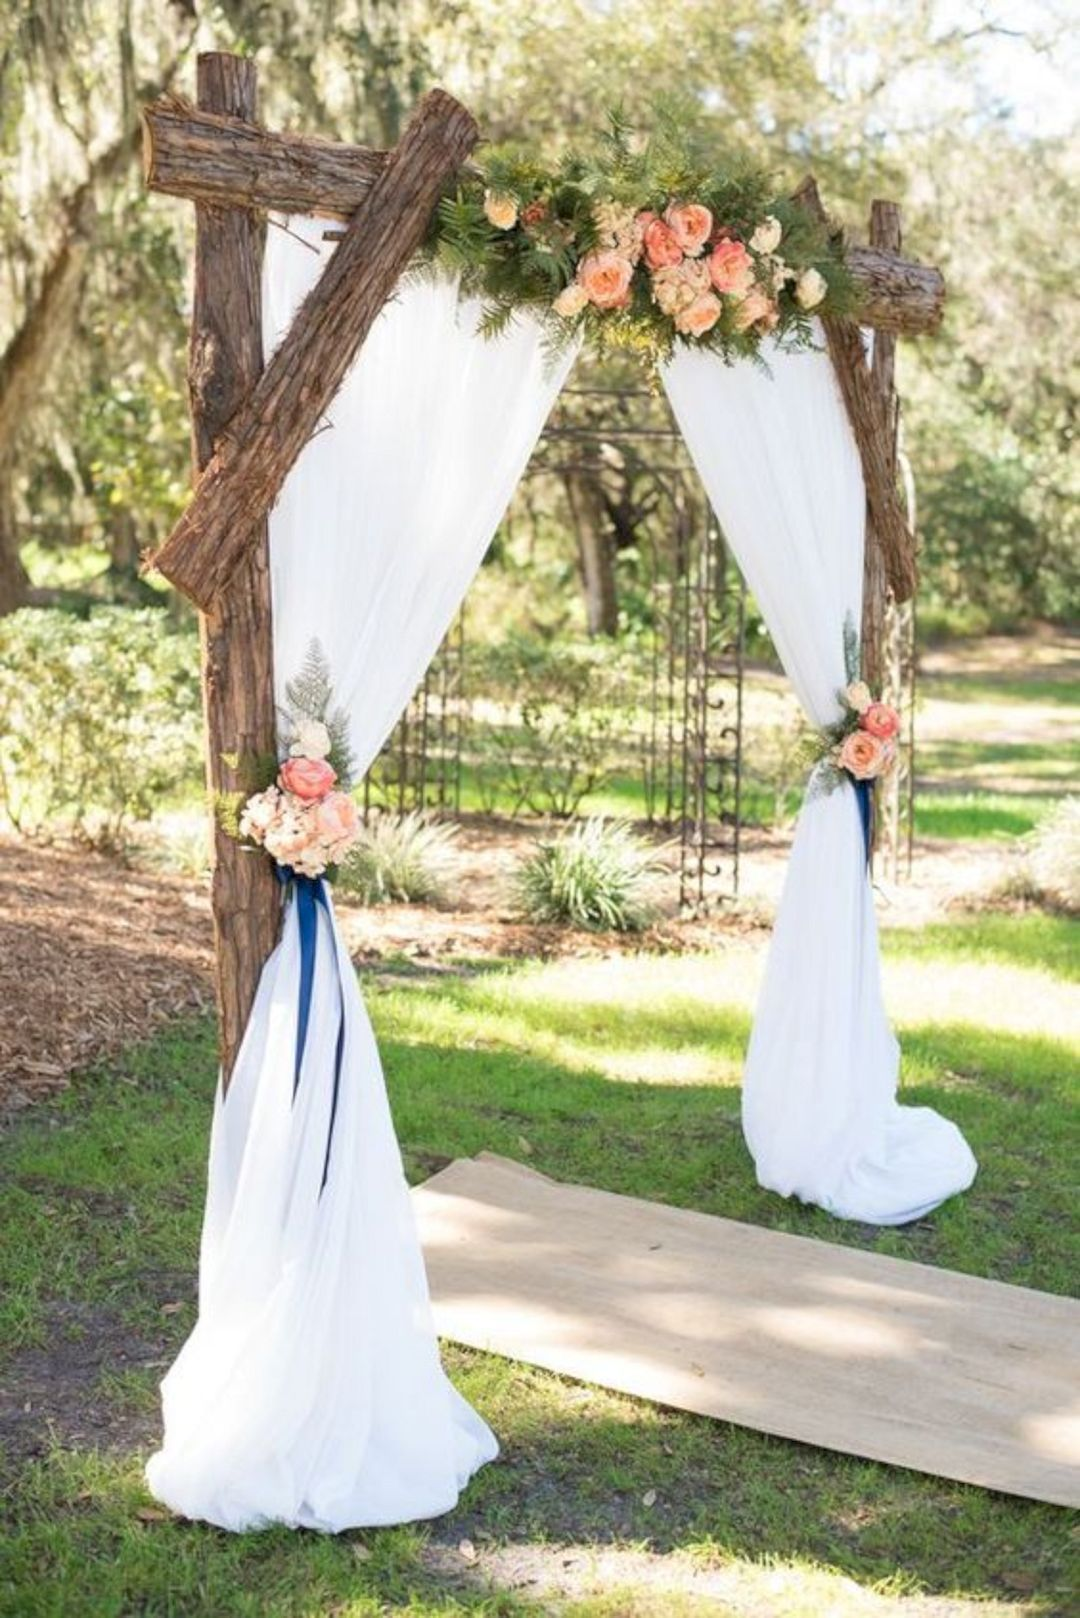 Backyard wedding ideas 1 weddingideasreception its go time backyard wedding ideas 1 weddingideasreception junglespirit Gallery